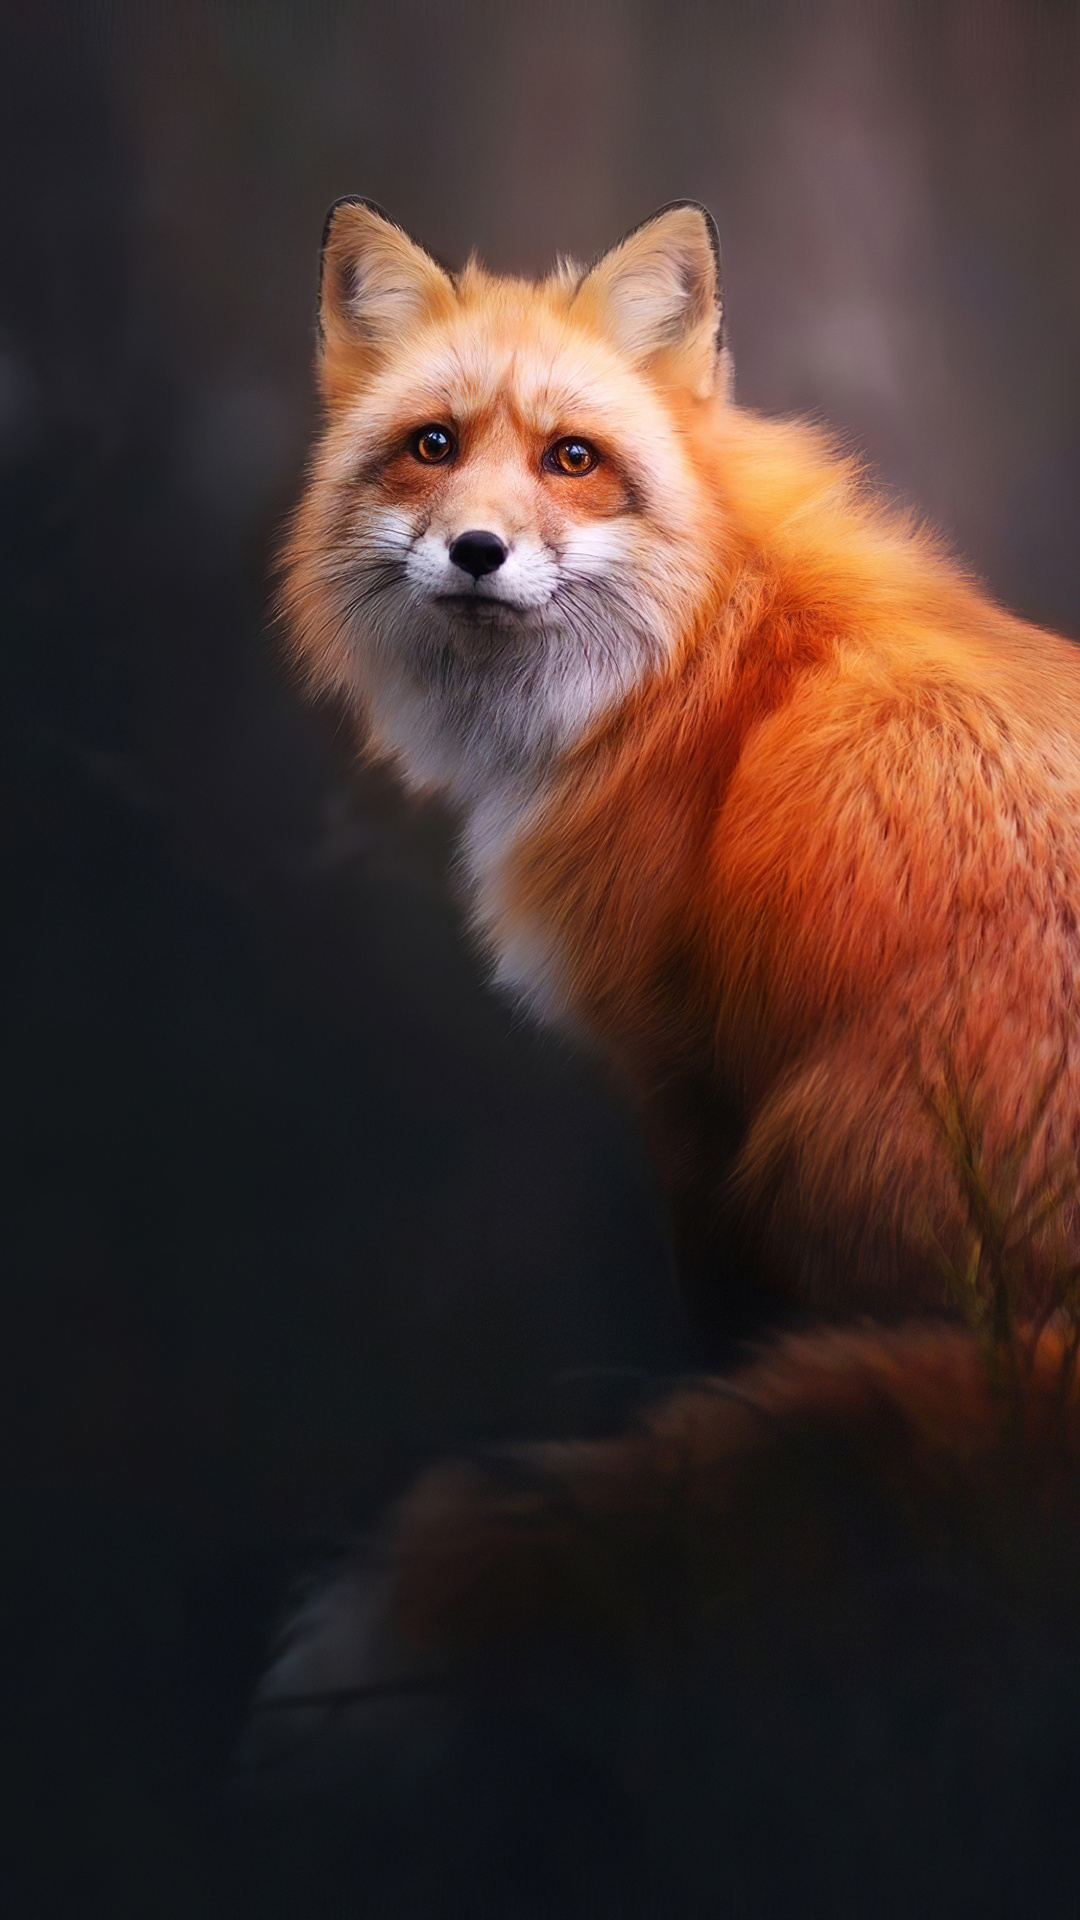 fox-digital-art-4k-qg.jpg